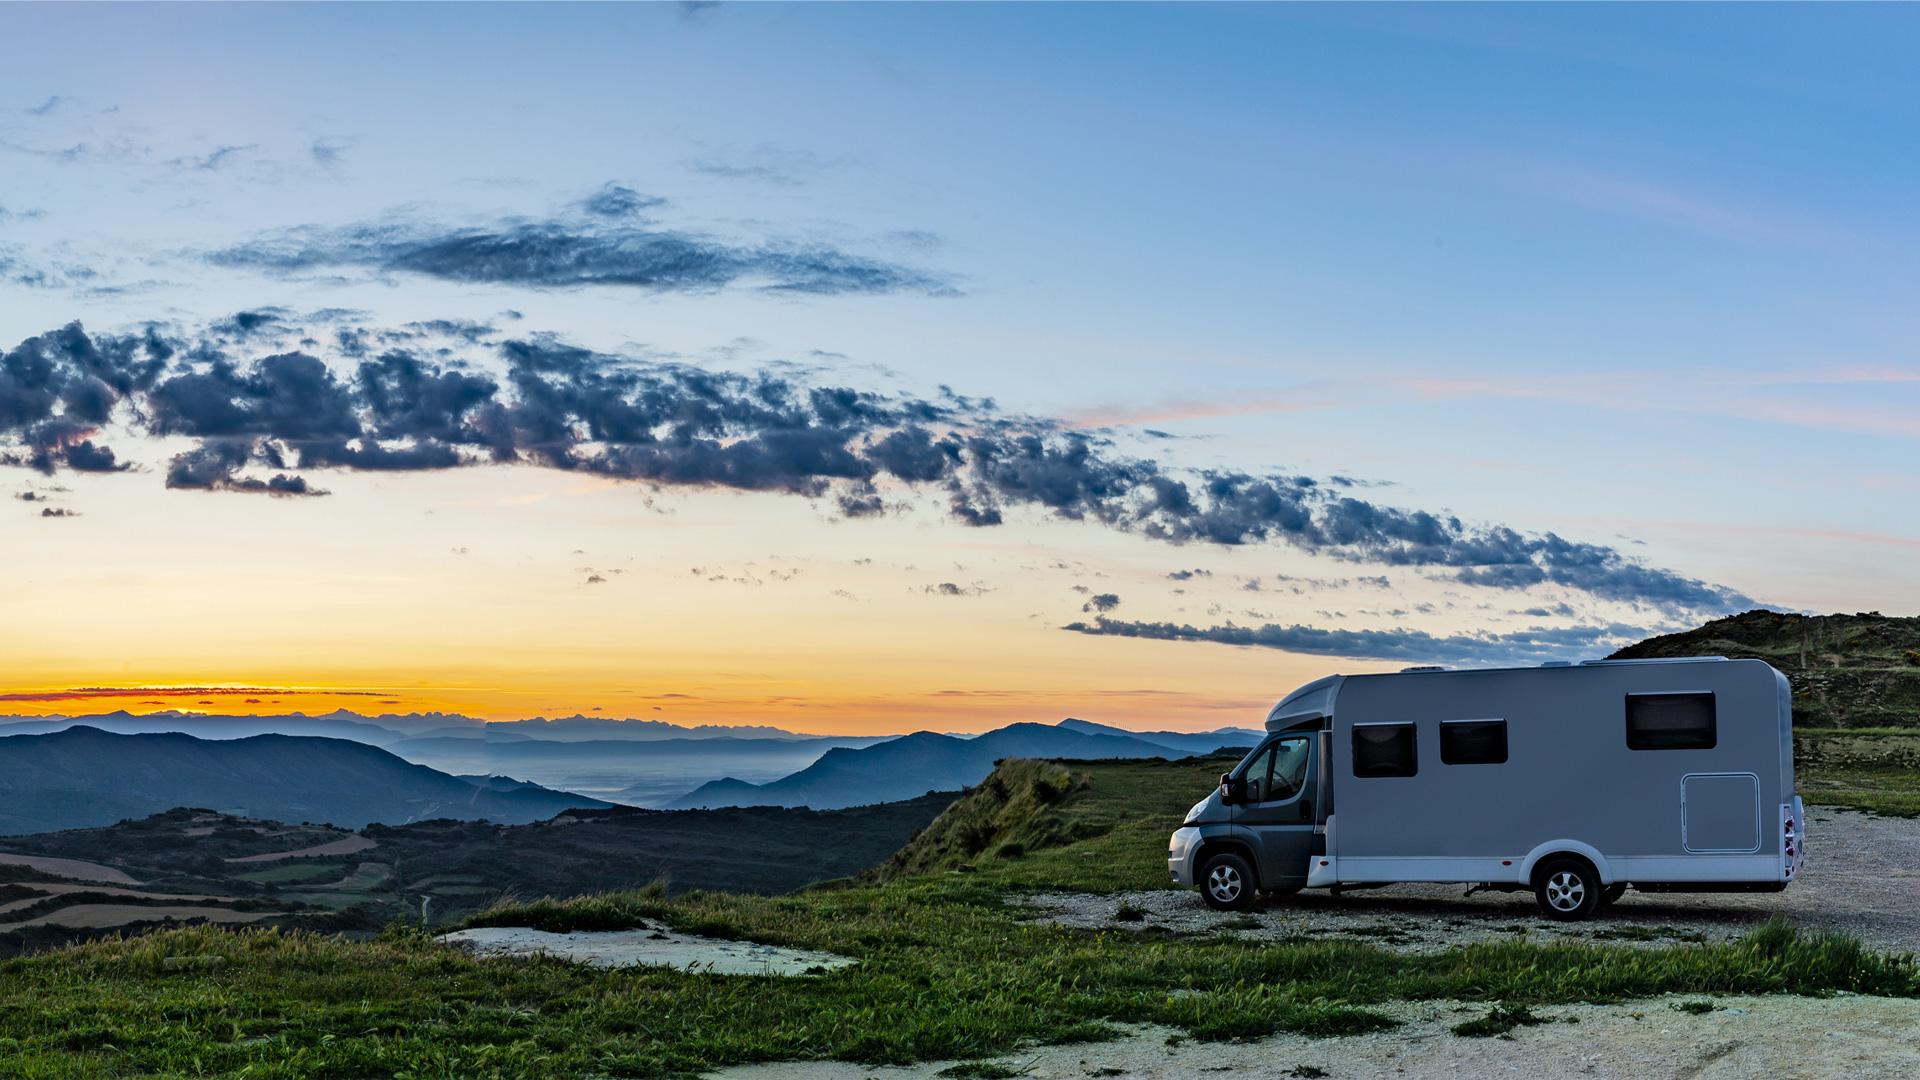 Reisemobil Sonnenaufgang